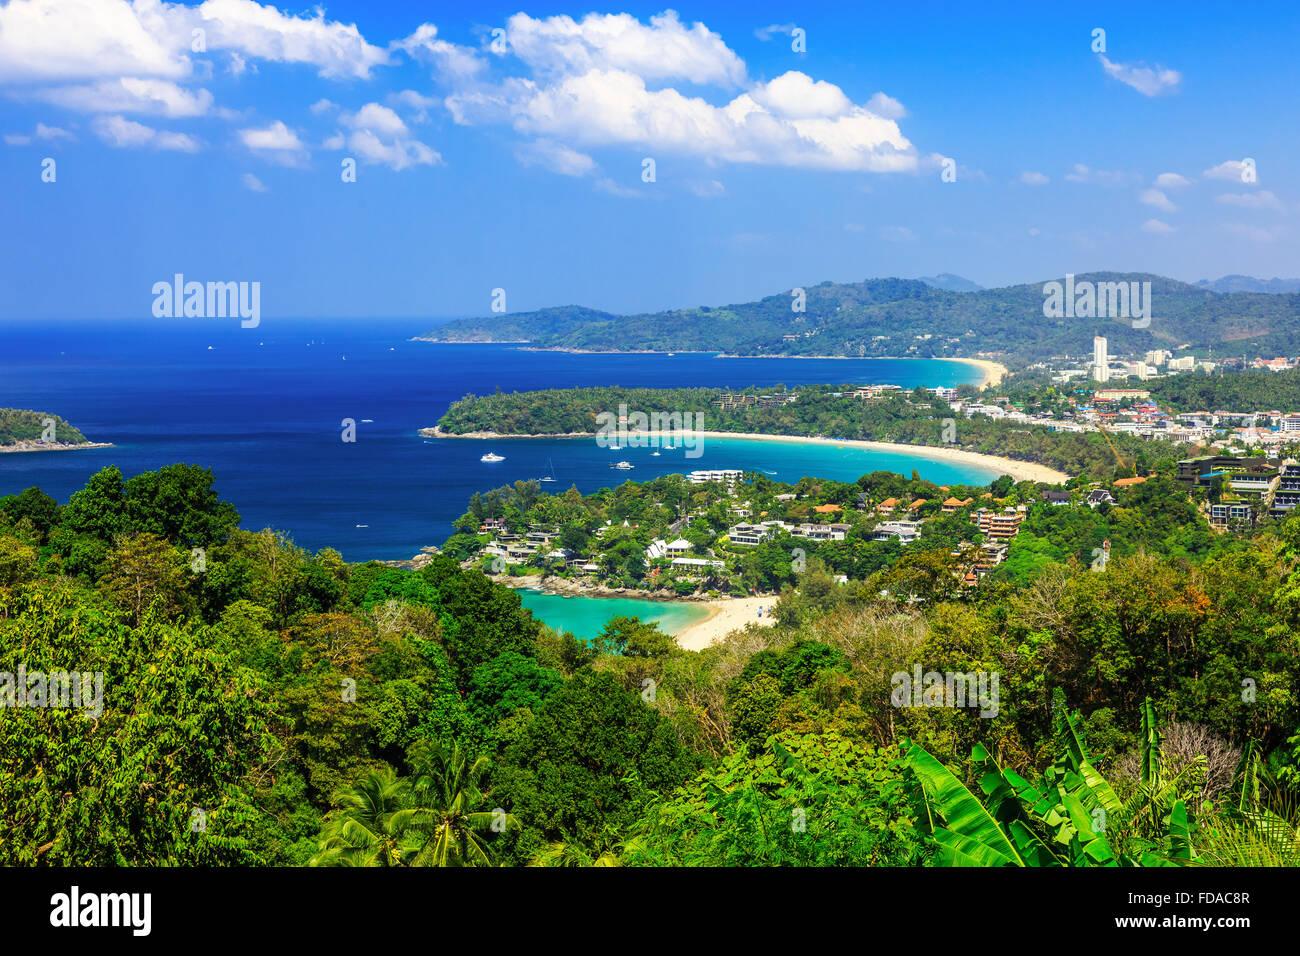 Thailandia Phuket. Punto di vista di Kata Noi, Karon Beach e Spiaggia di Patong. Foto Stock